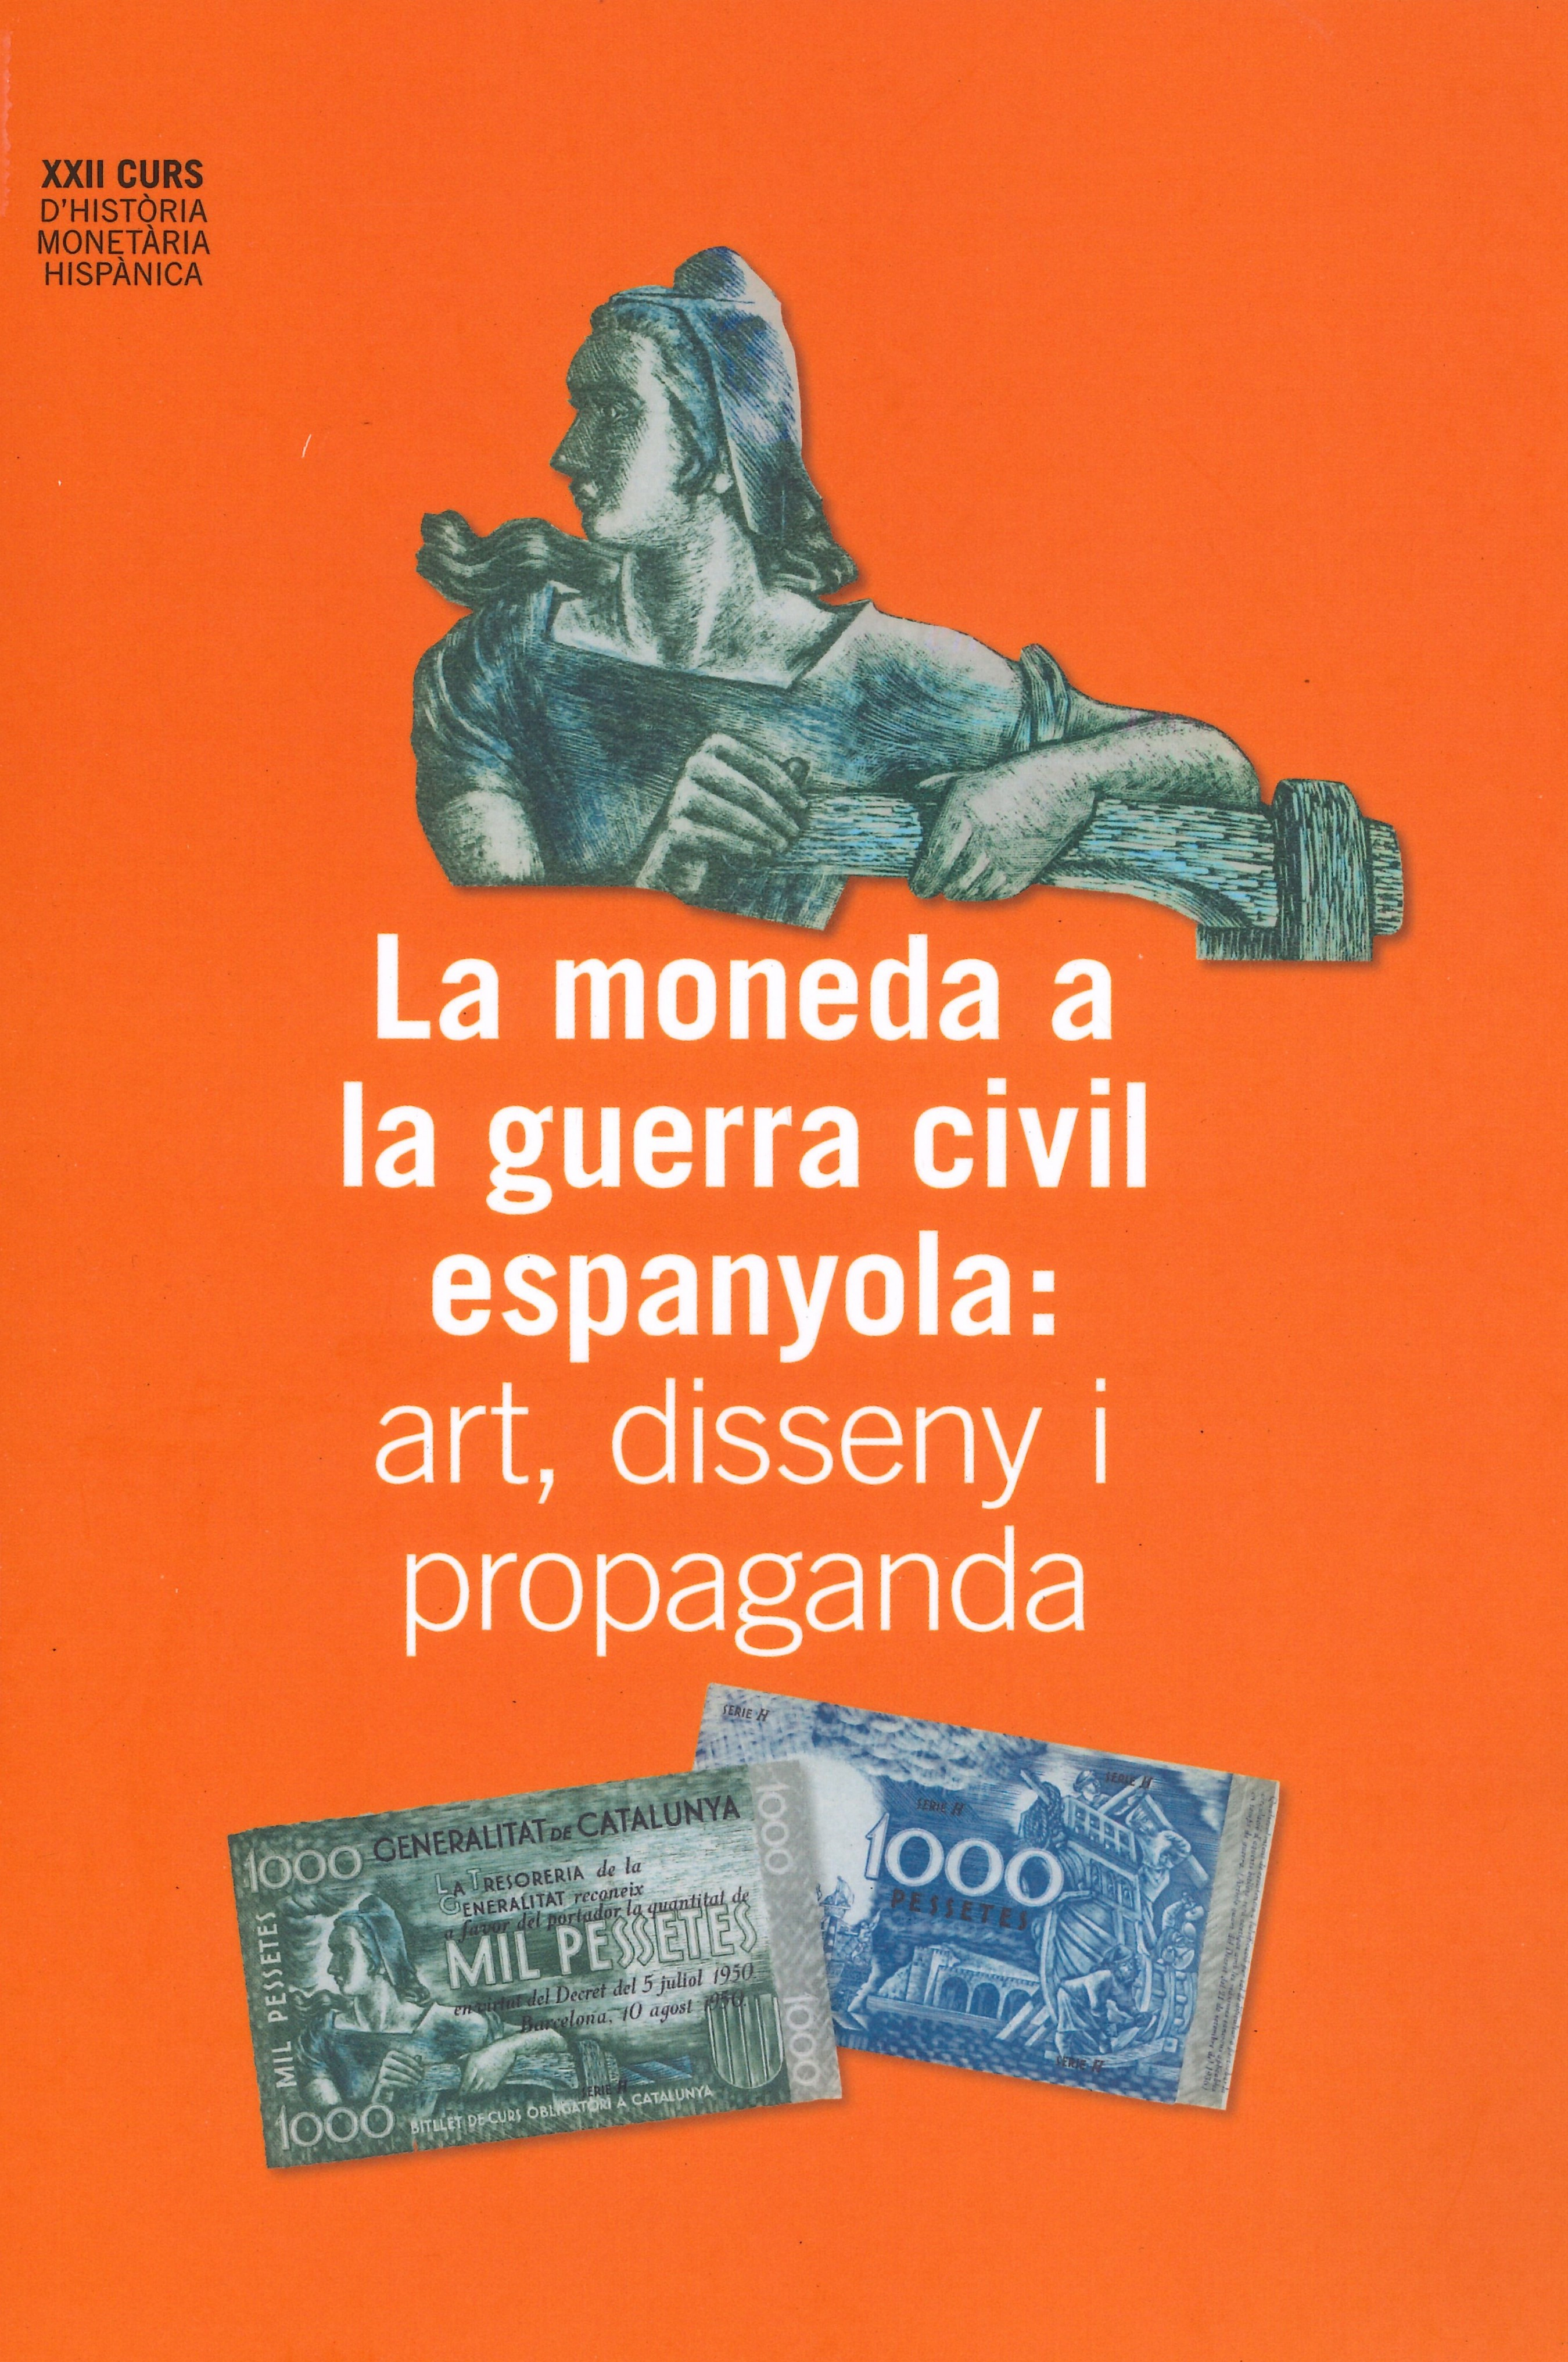 moneda_guerra_civil.jpg